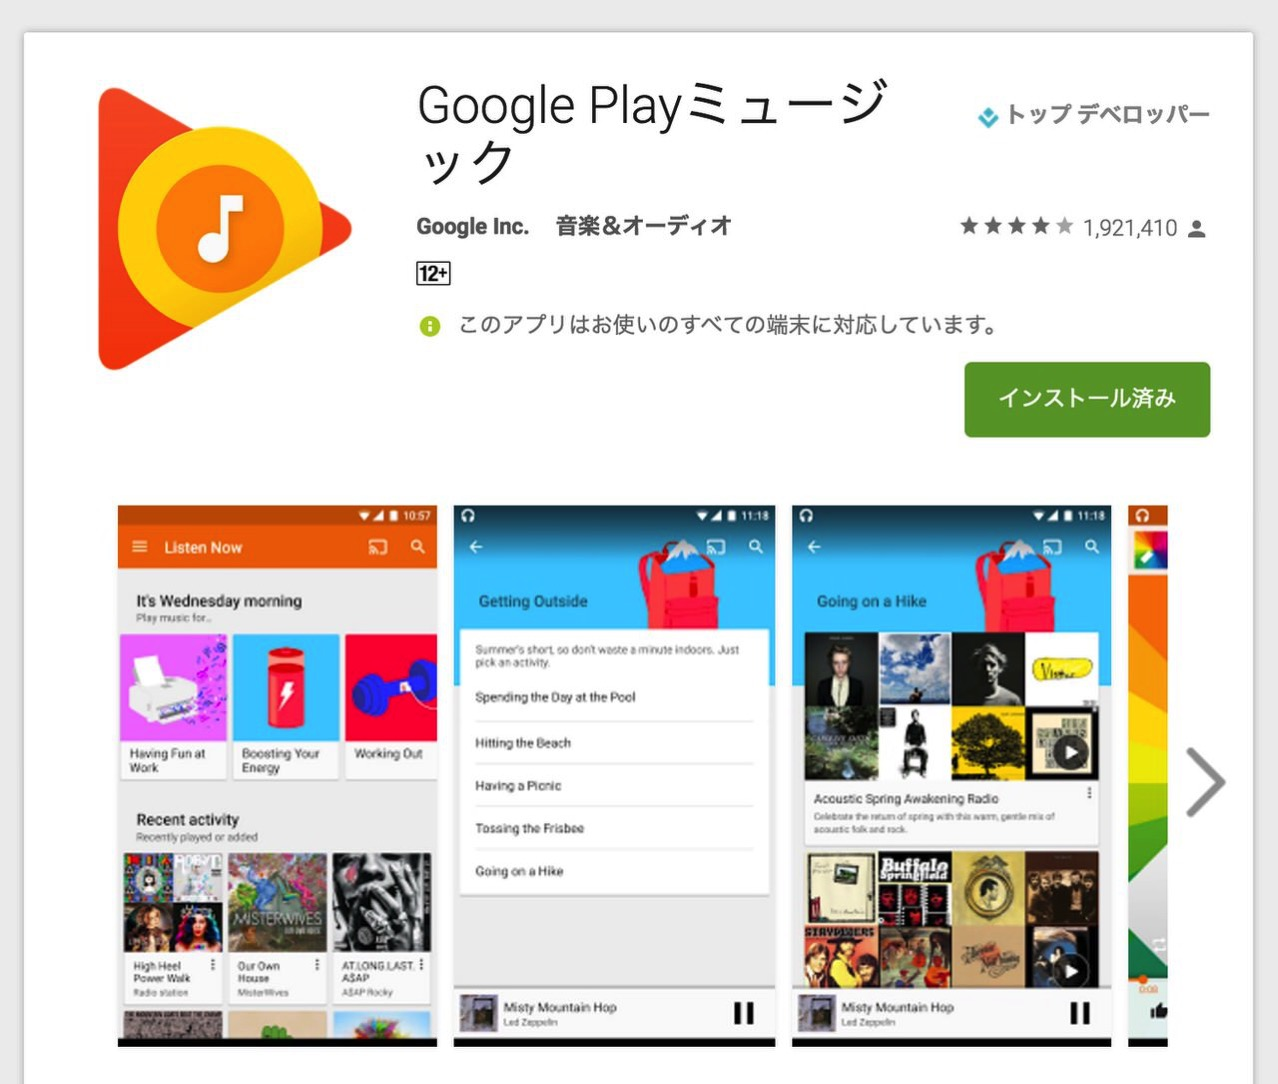 【Google Play Music】家族で楽しめるファミリープランを月額1,480円で提供開始へ